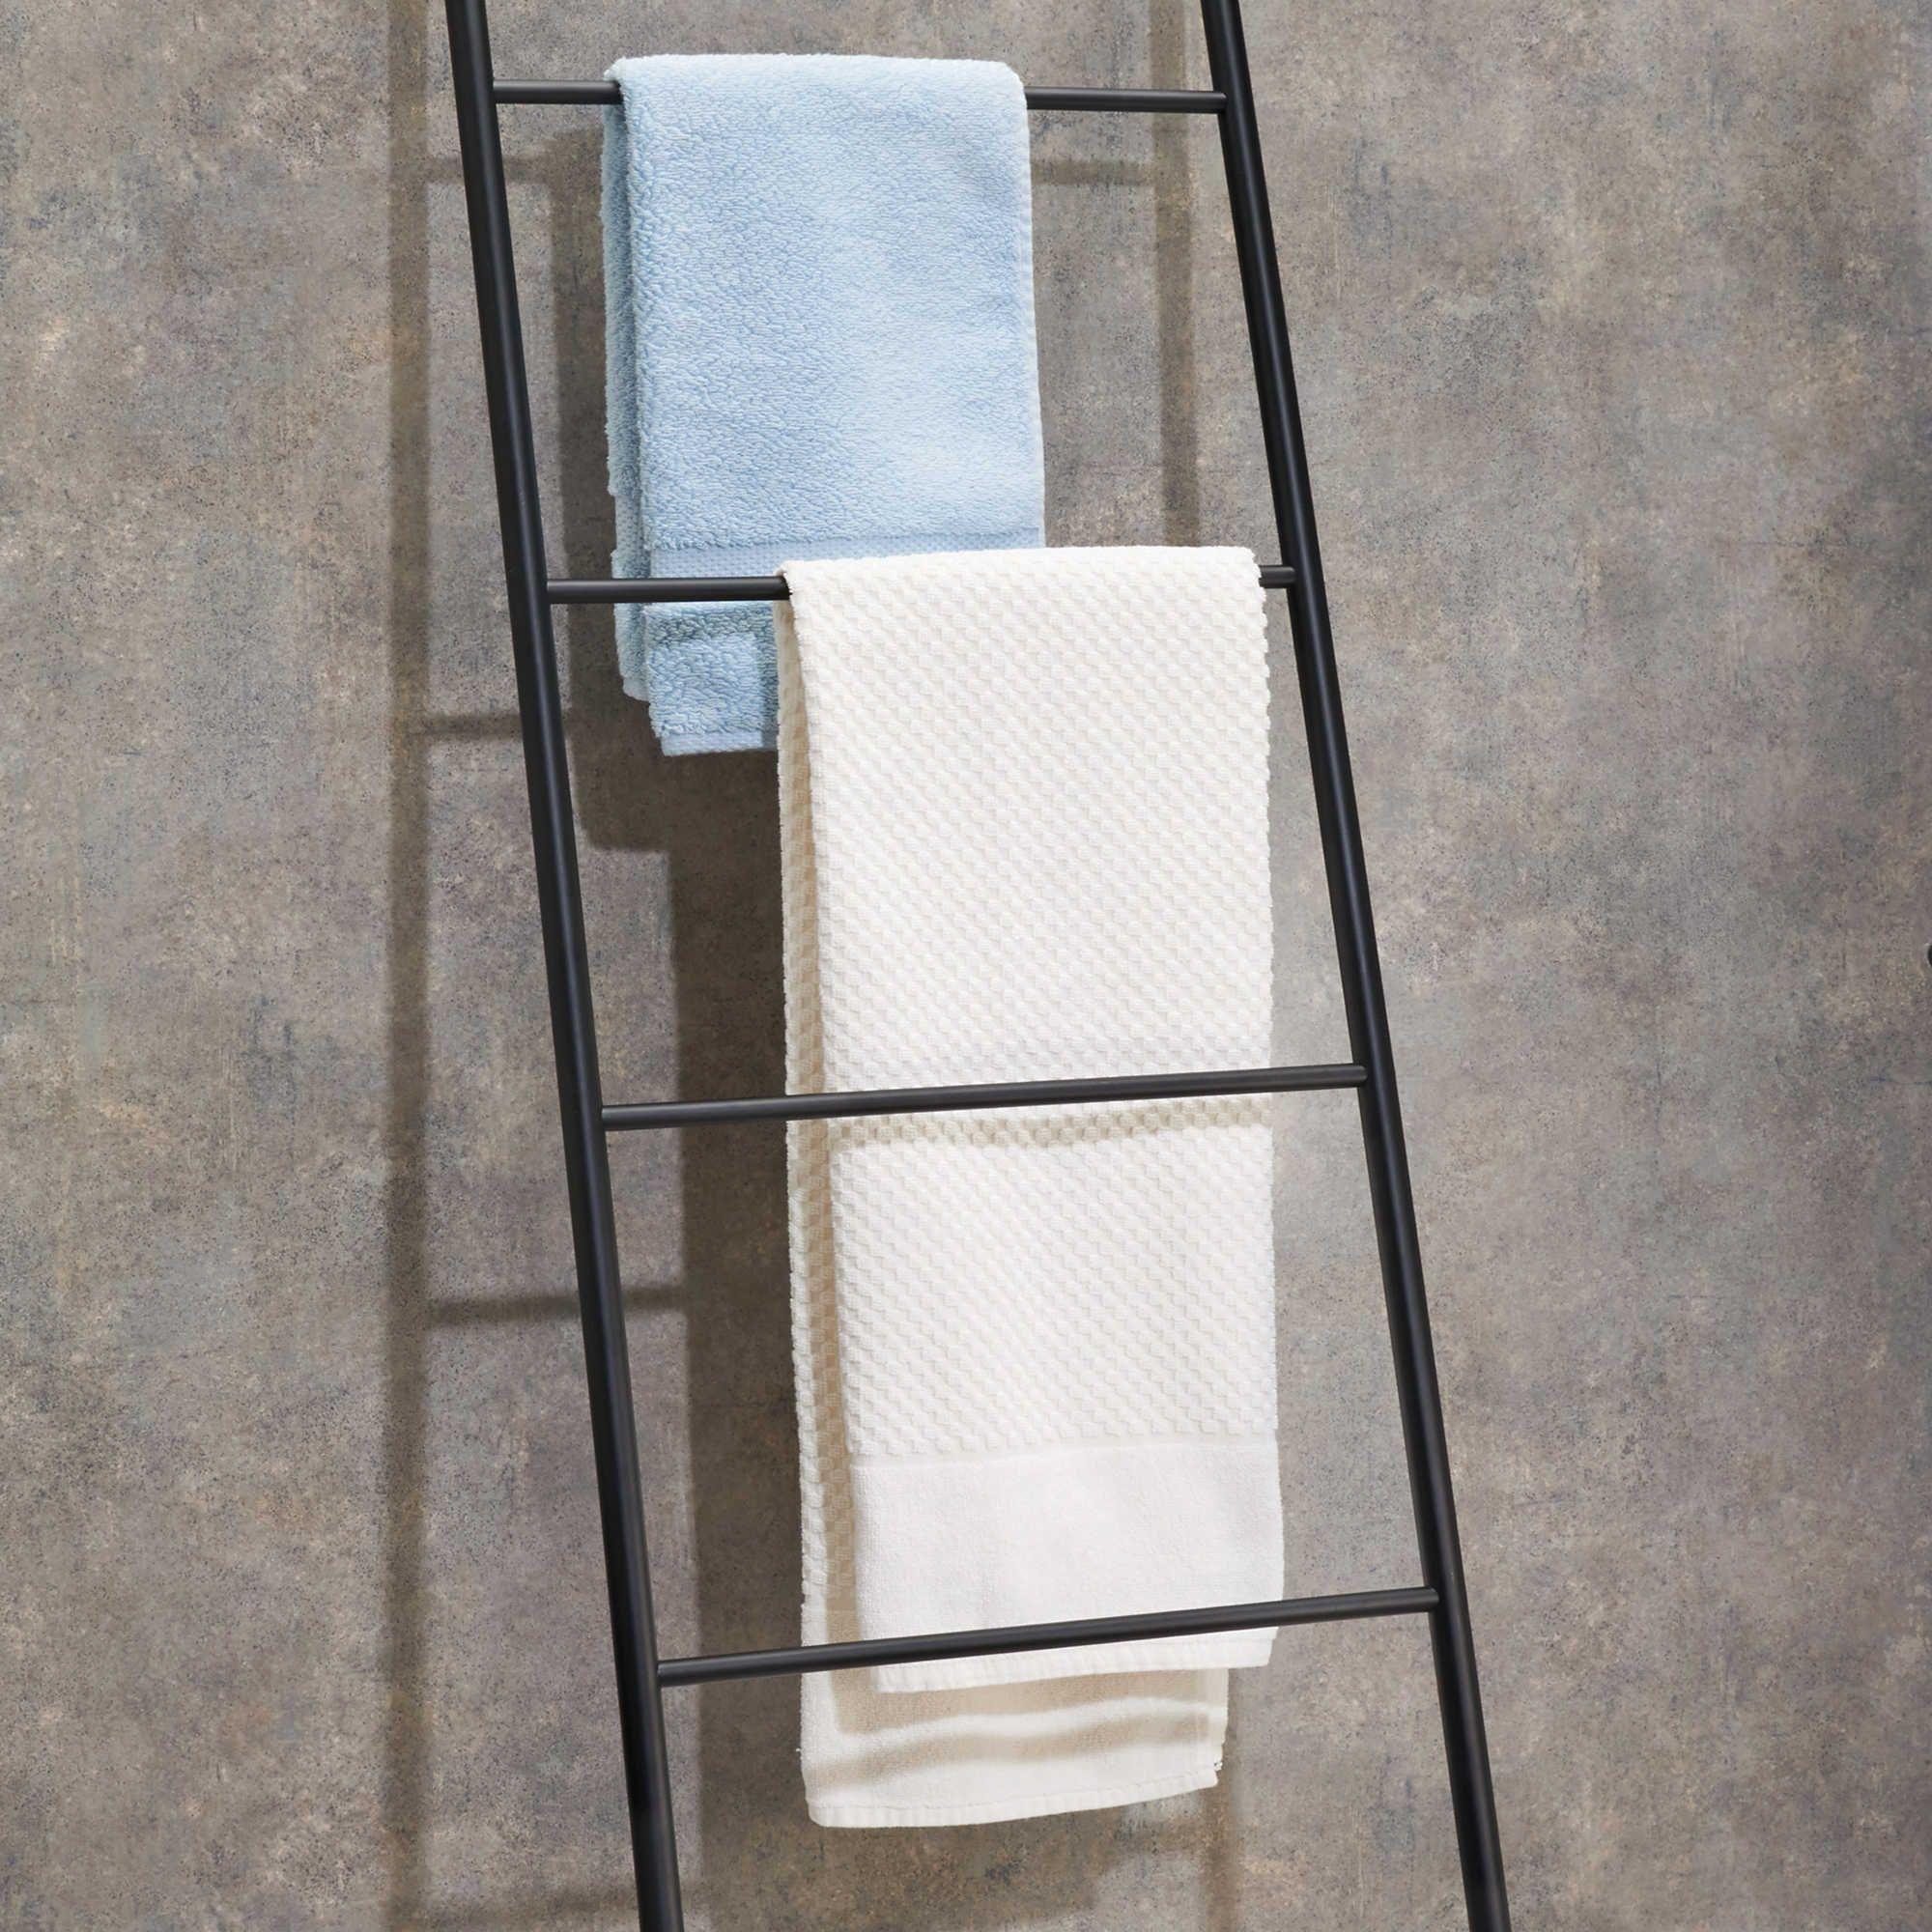 Interdesign Forma Free Standing Towel Ladder Towel Ladder